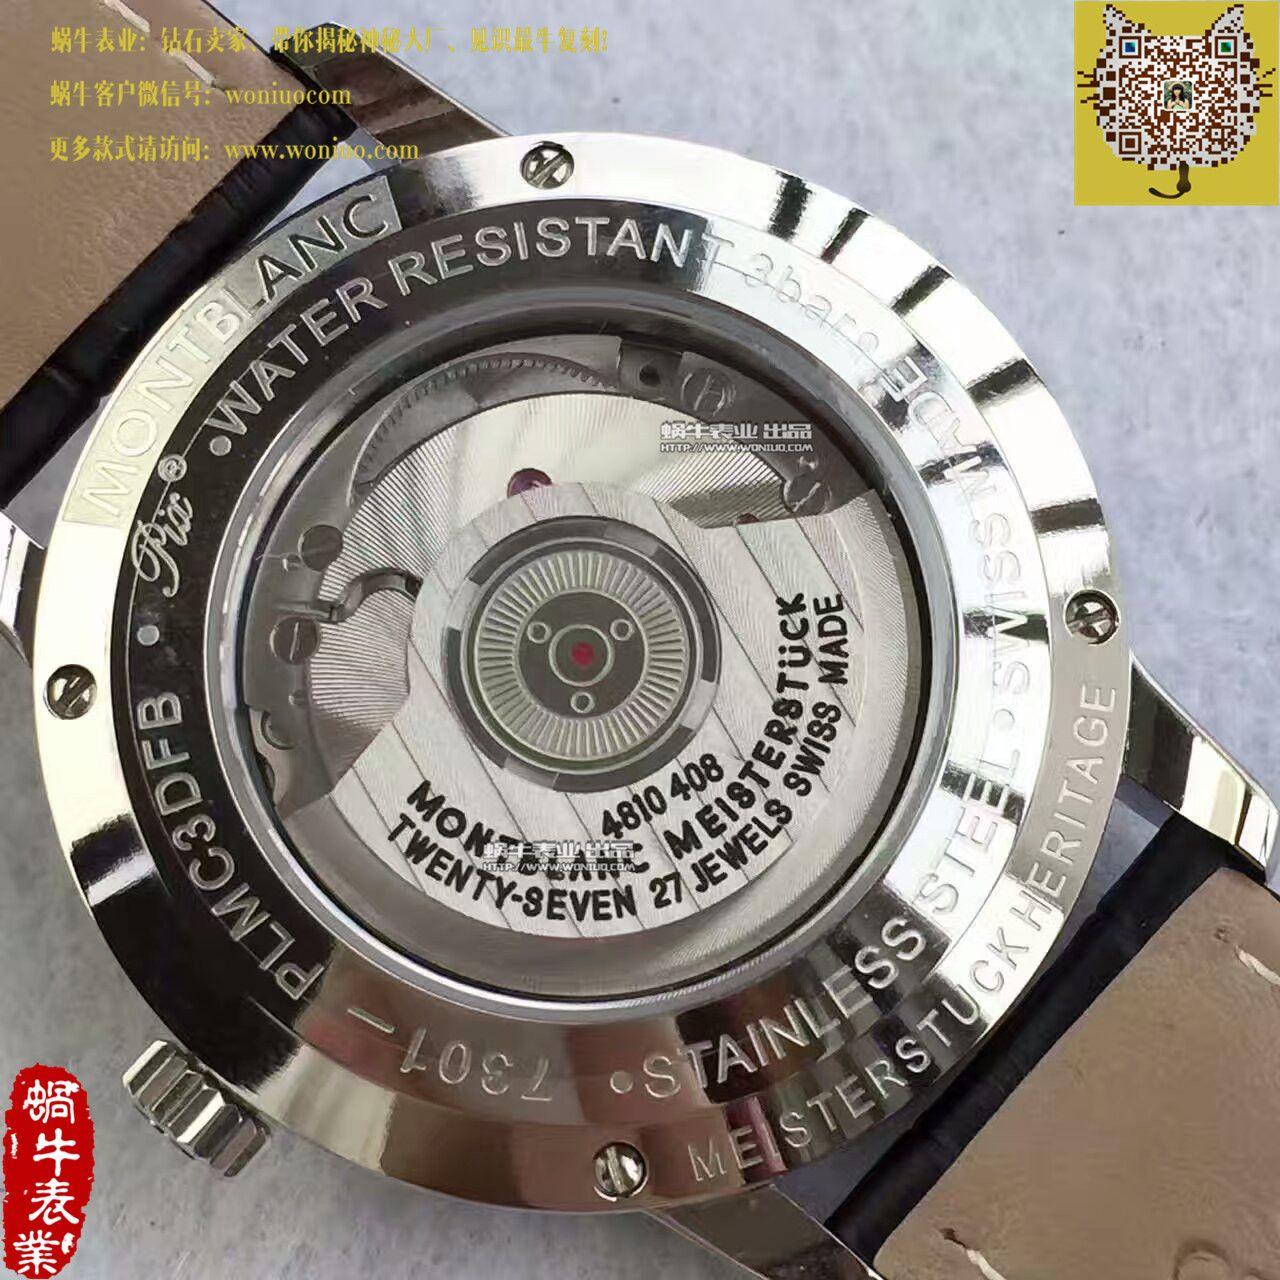 【VF厂一比一精仿手表】万宝龙HERITAGE SPIRIT系列U0111620腕表 MB003.1 / MB003.1